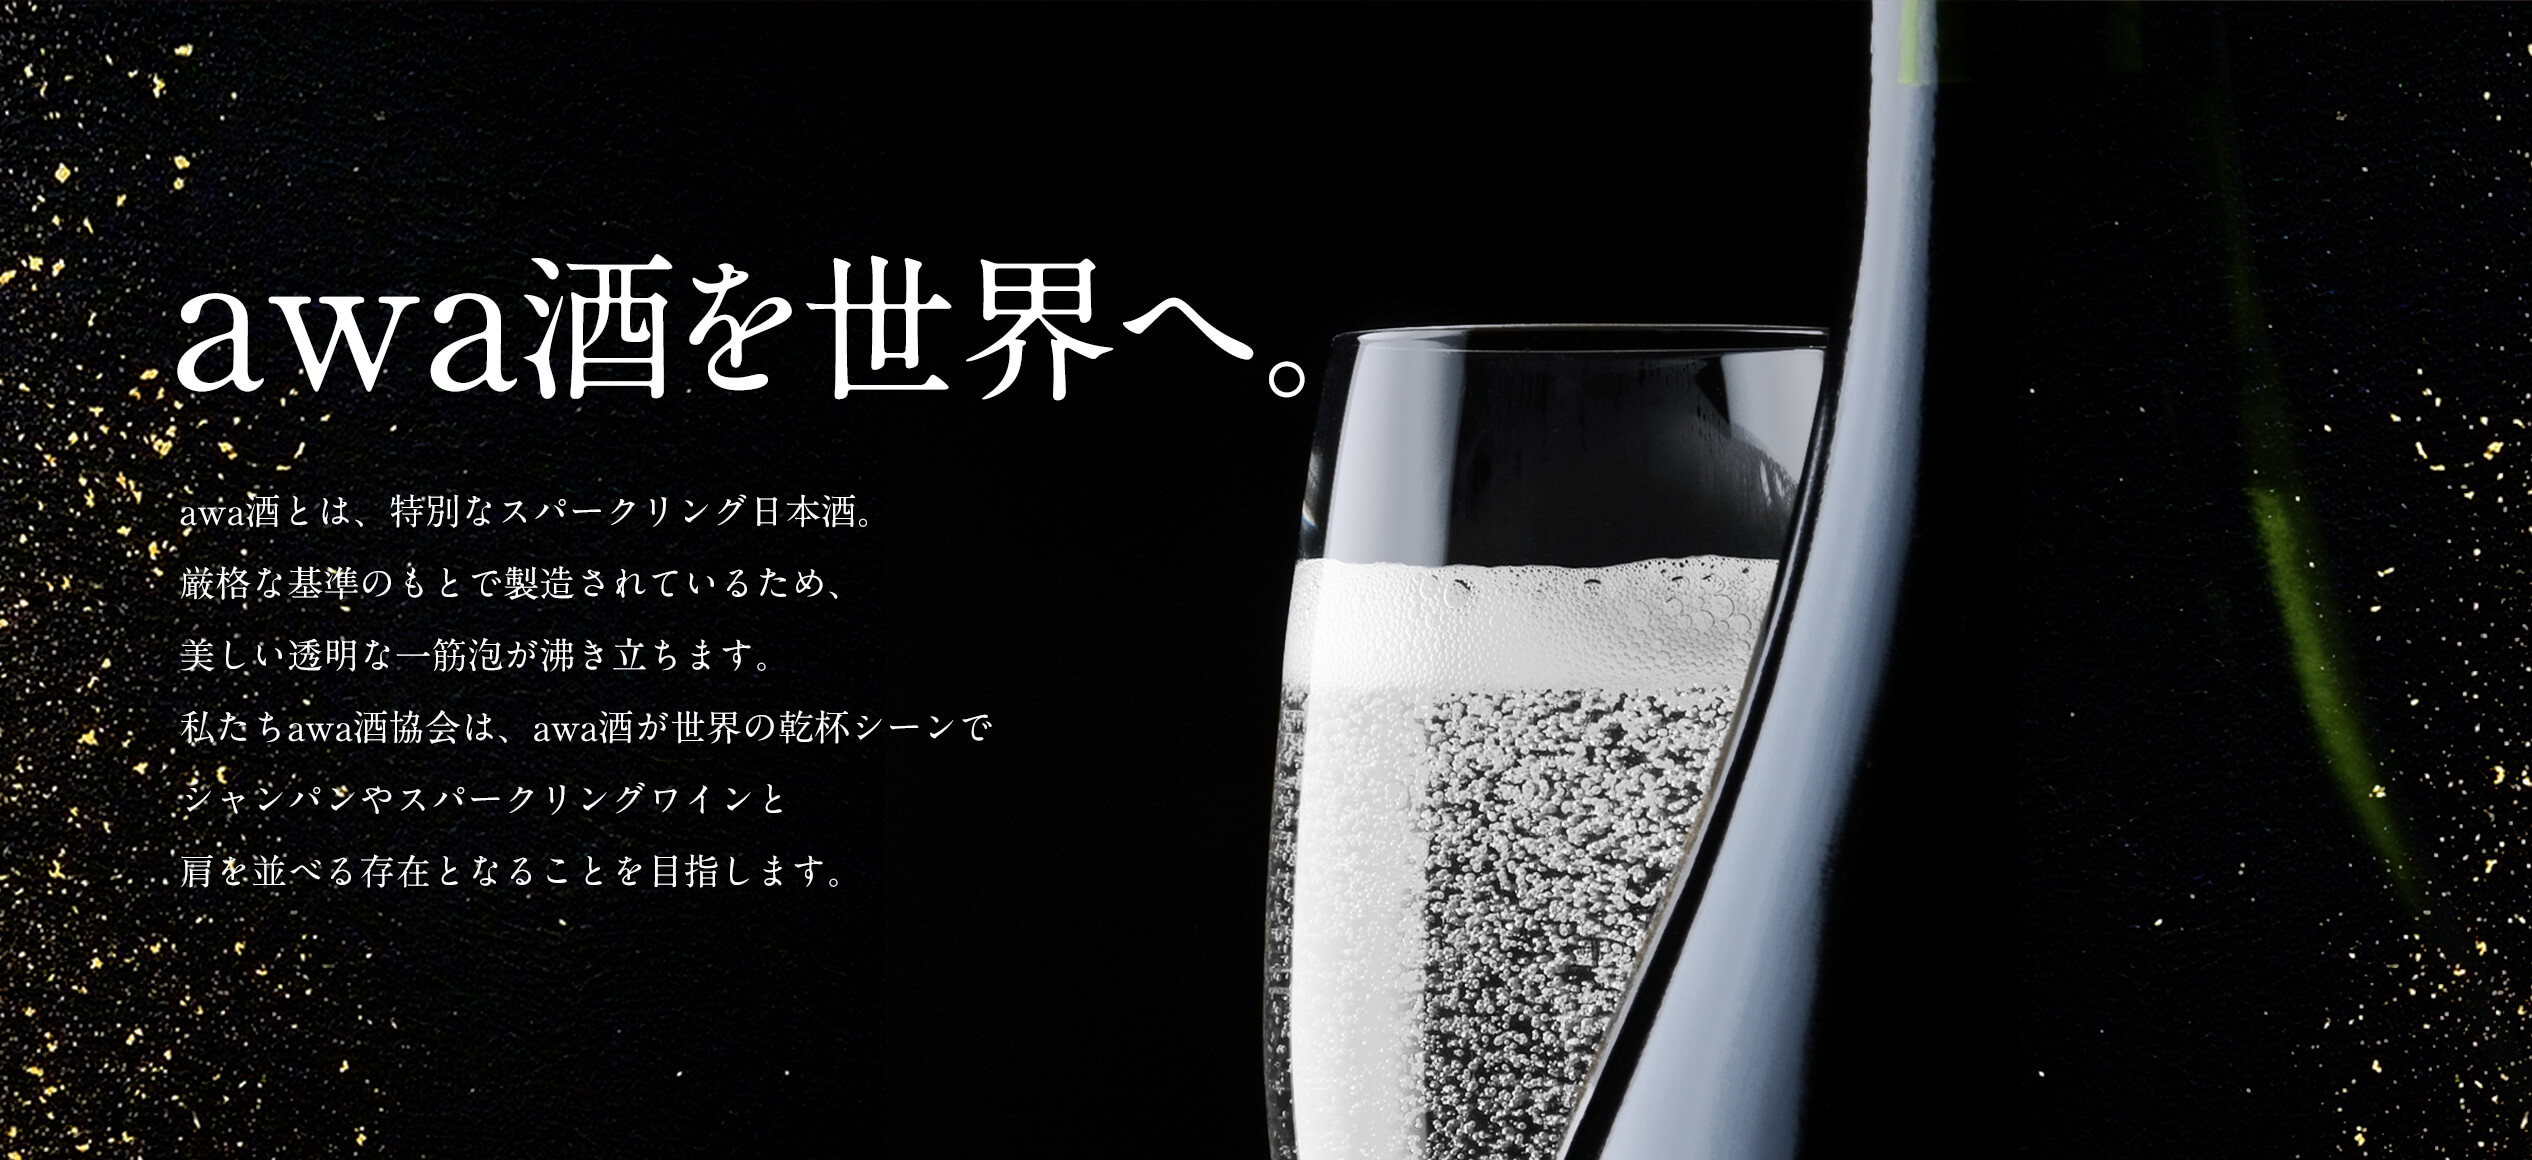 awa酒を世界へ。 awa酒とは、特別なスパークリング日本酒。厳格な基準のもとで製造されているため、美しい透明な一筋泡が沸き立ちます。私たちawa酒協会は、awa酒が世界の乾杯シーンでシャンパンやスパークリングワインと肩を並べる存在となることを目指します。